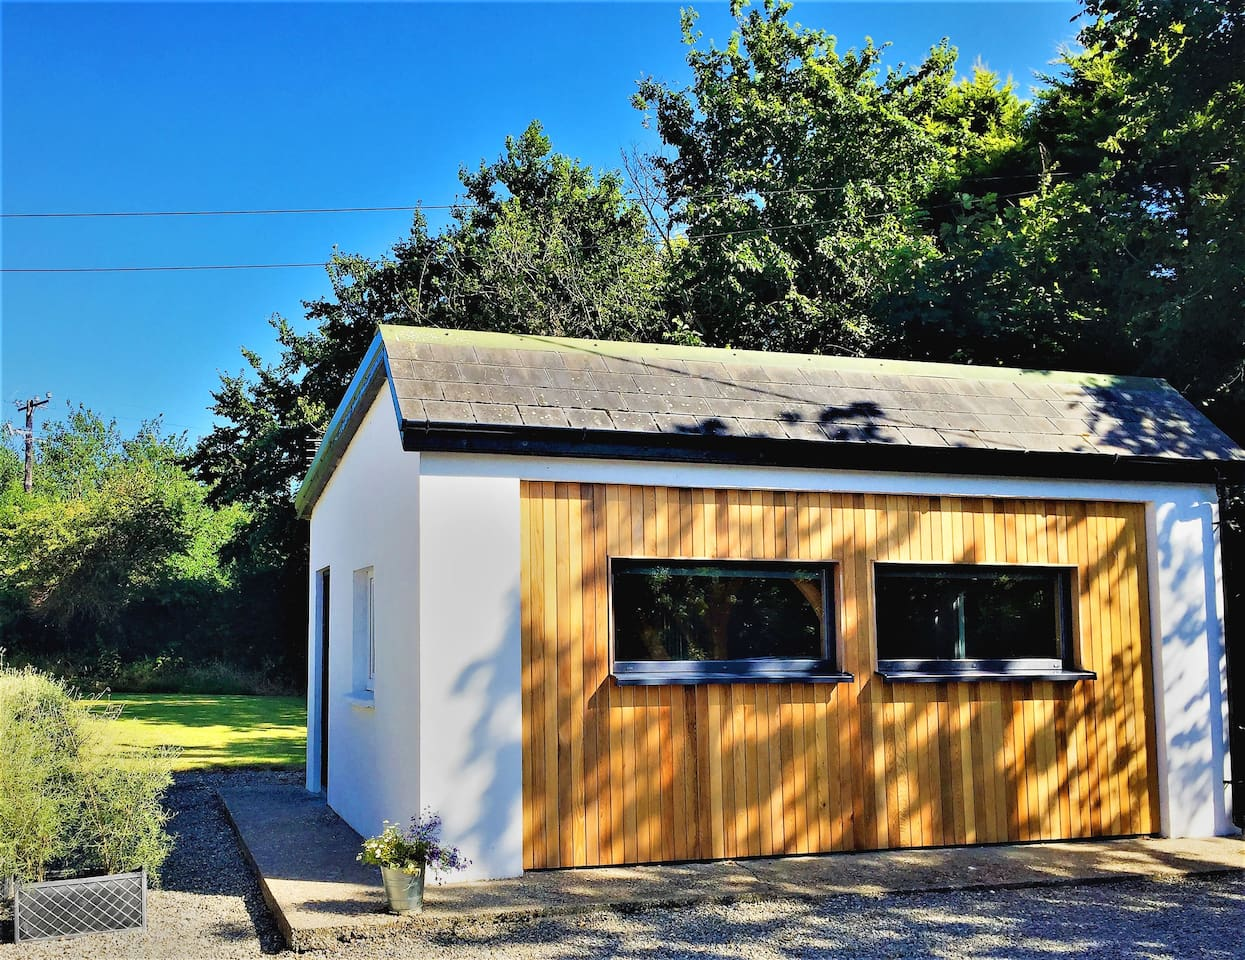 St Awaries Studio, Carne, Co. Wexford, Ireland